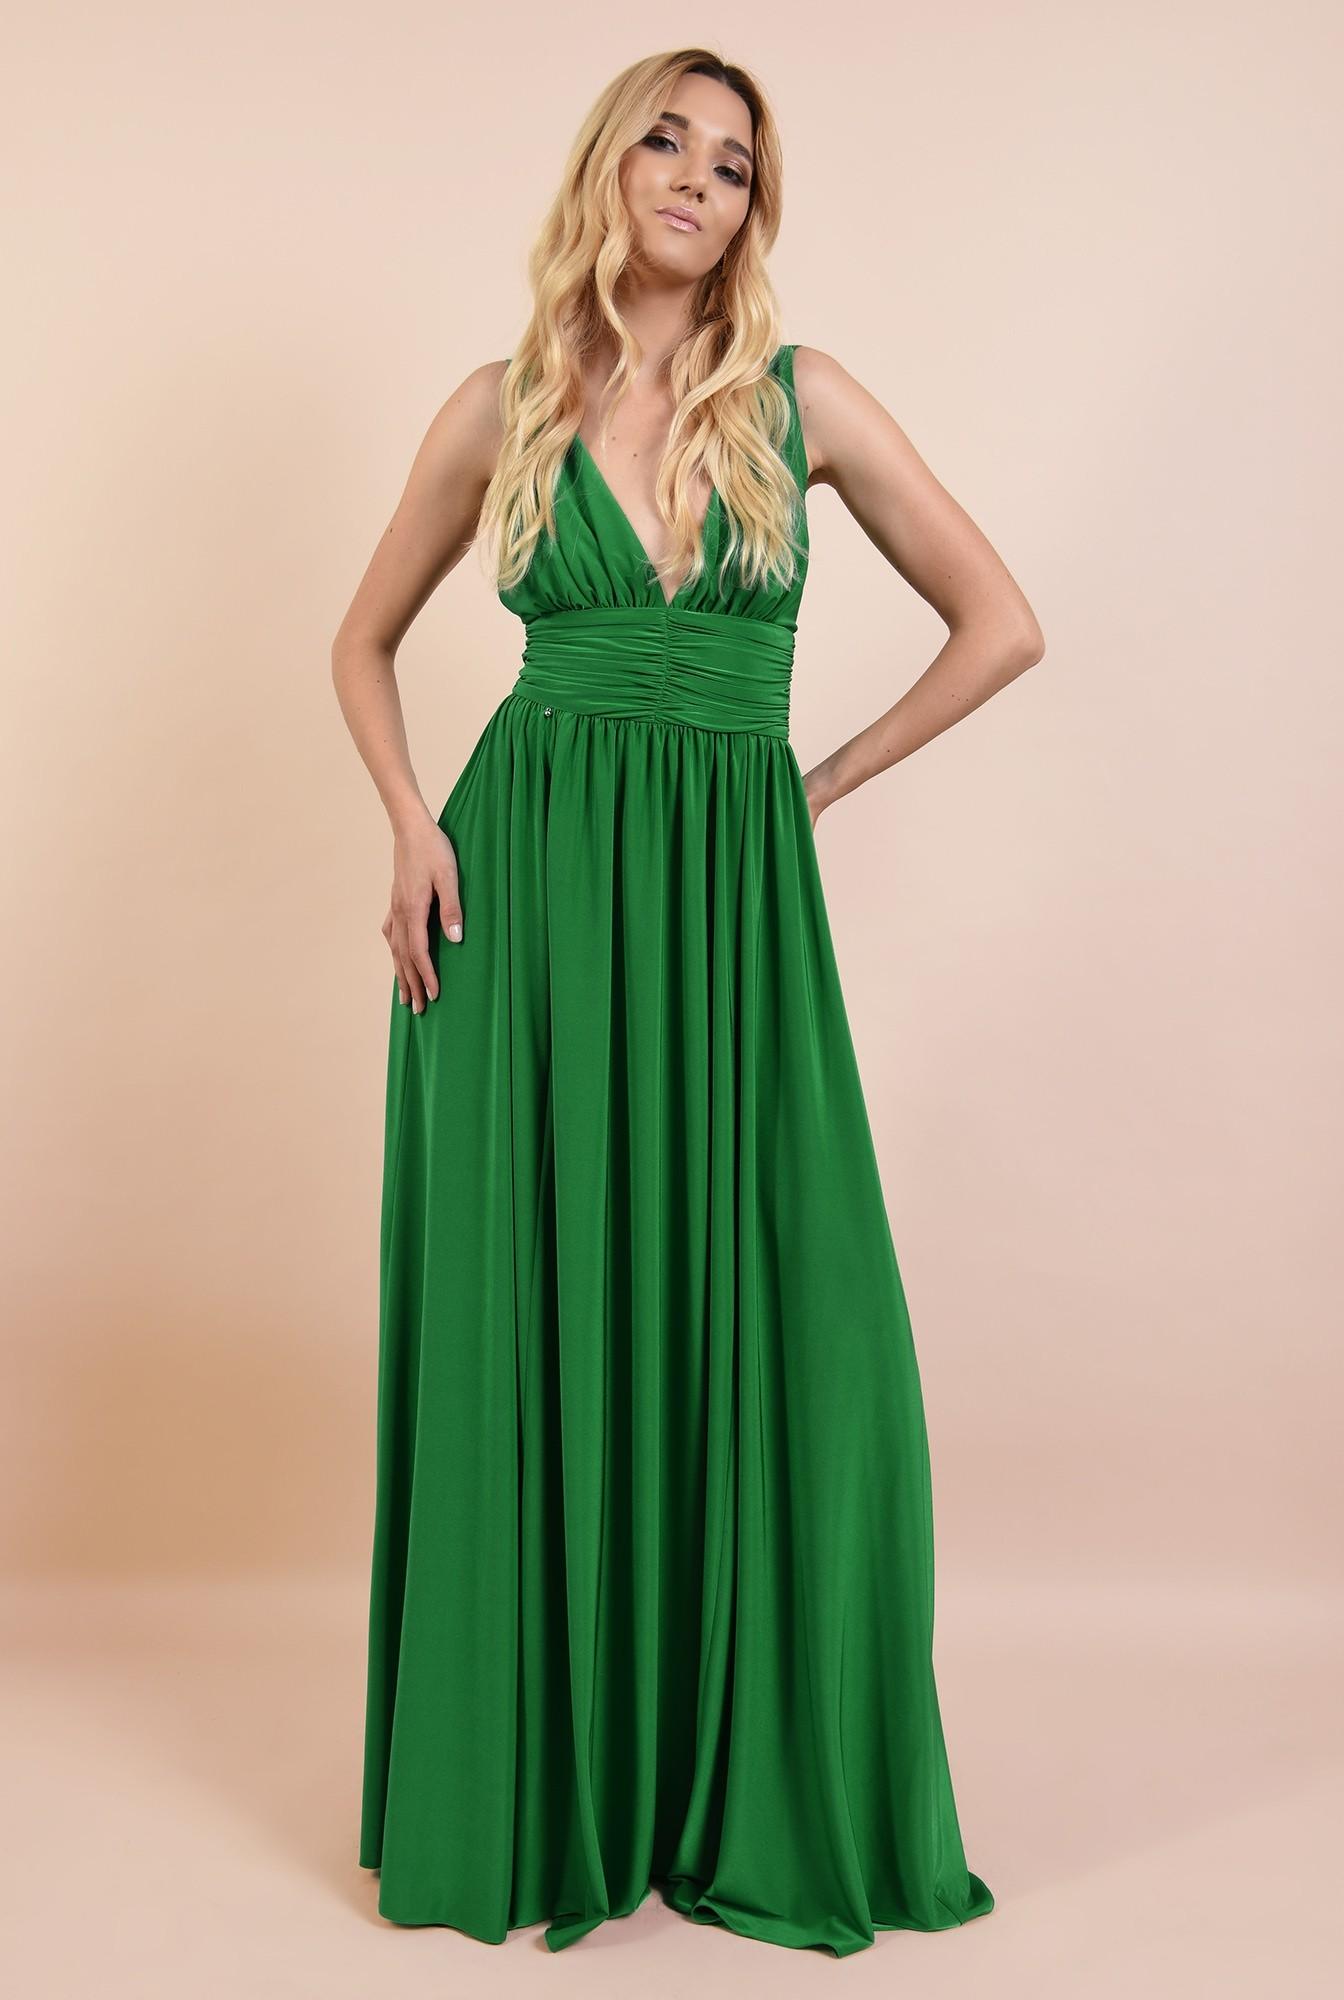 3 - rochie de ocazie, verde, din lycra, cu anchior adanc, spate gol, Poema